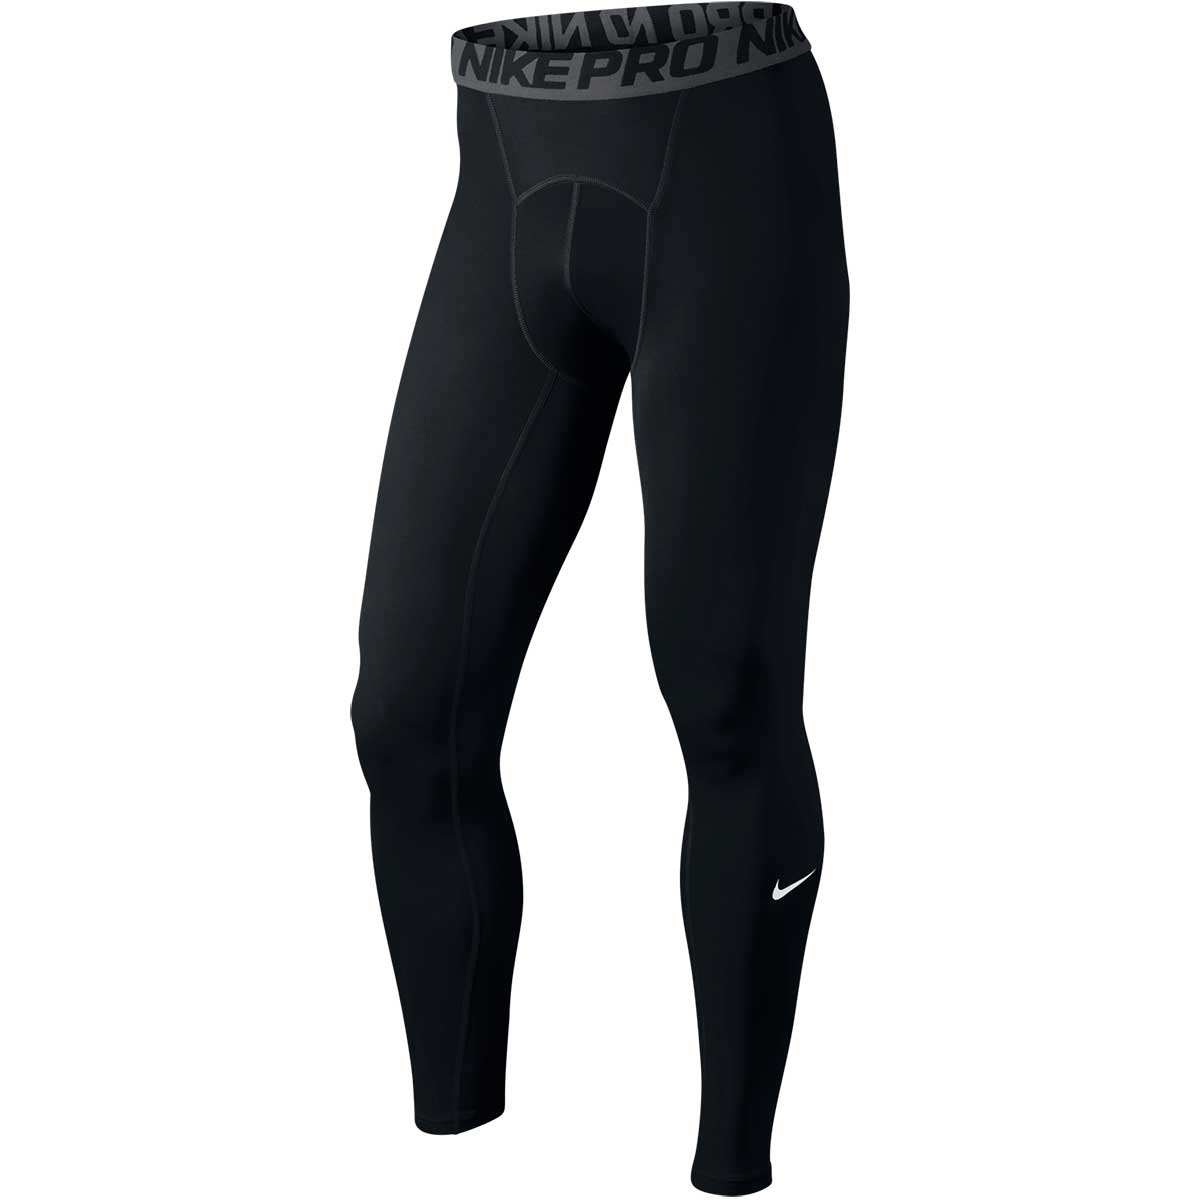 Norteamérica implicar paso  Buy Nike Pro Combat Tights Online India|Nike Men Running Clothing